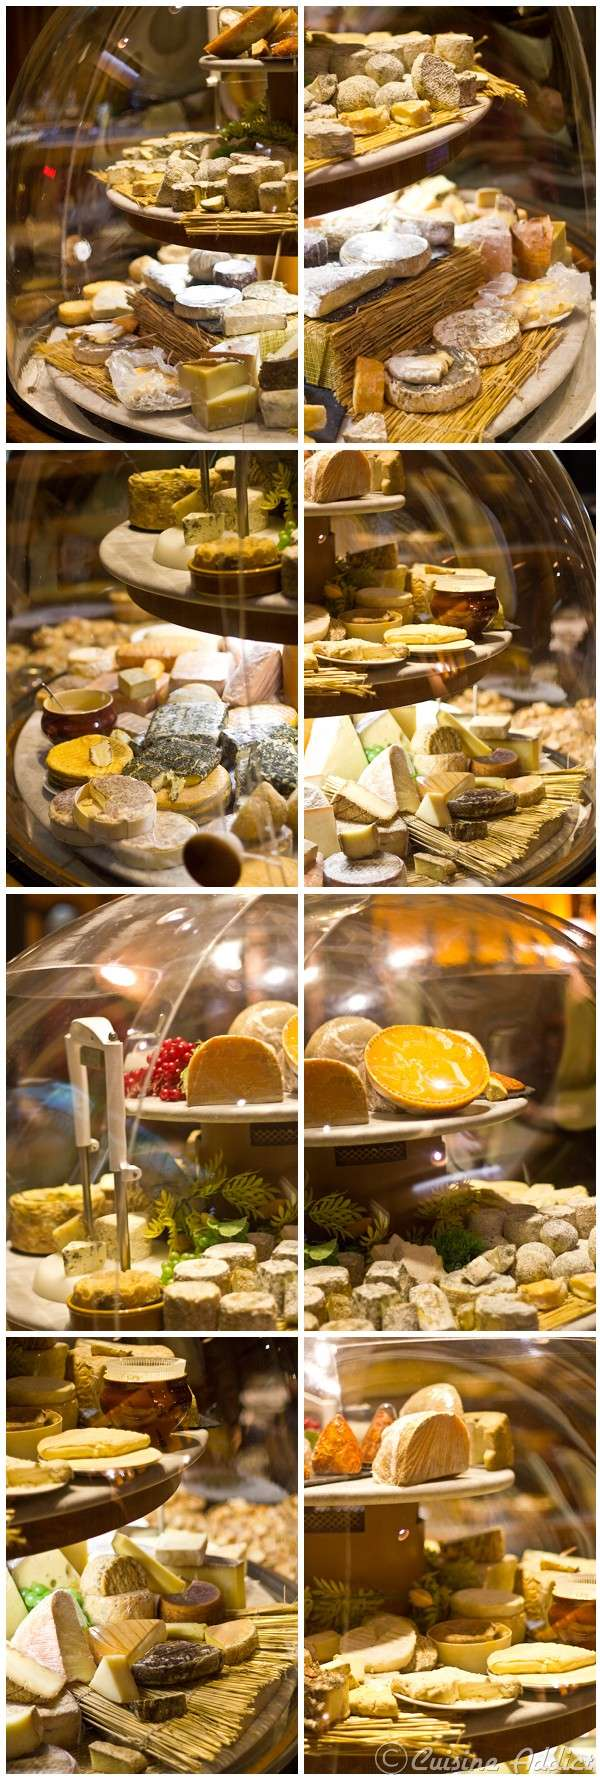 https://cuisine-addict.com/wp-content/uploads/2013/02/cloche13.jpg